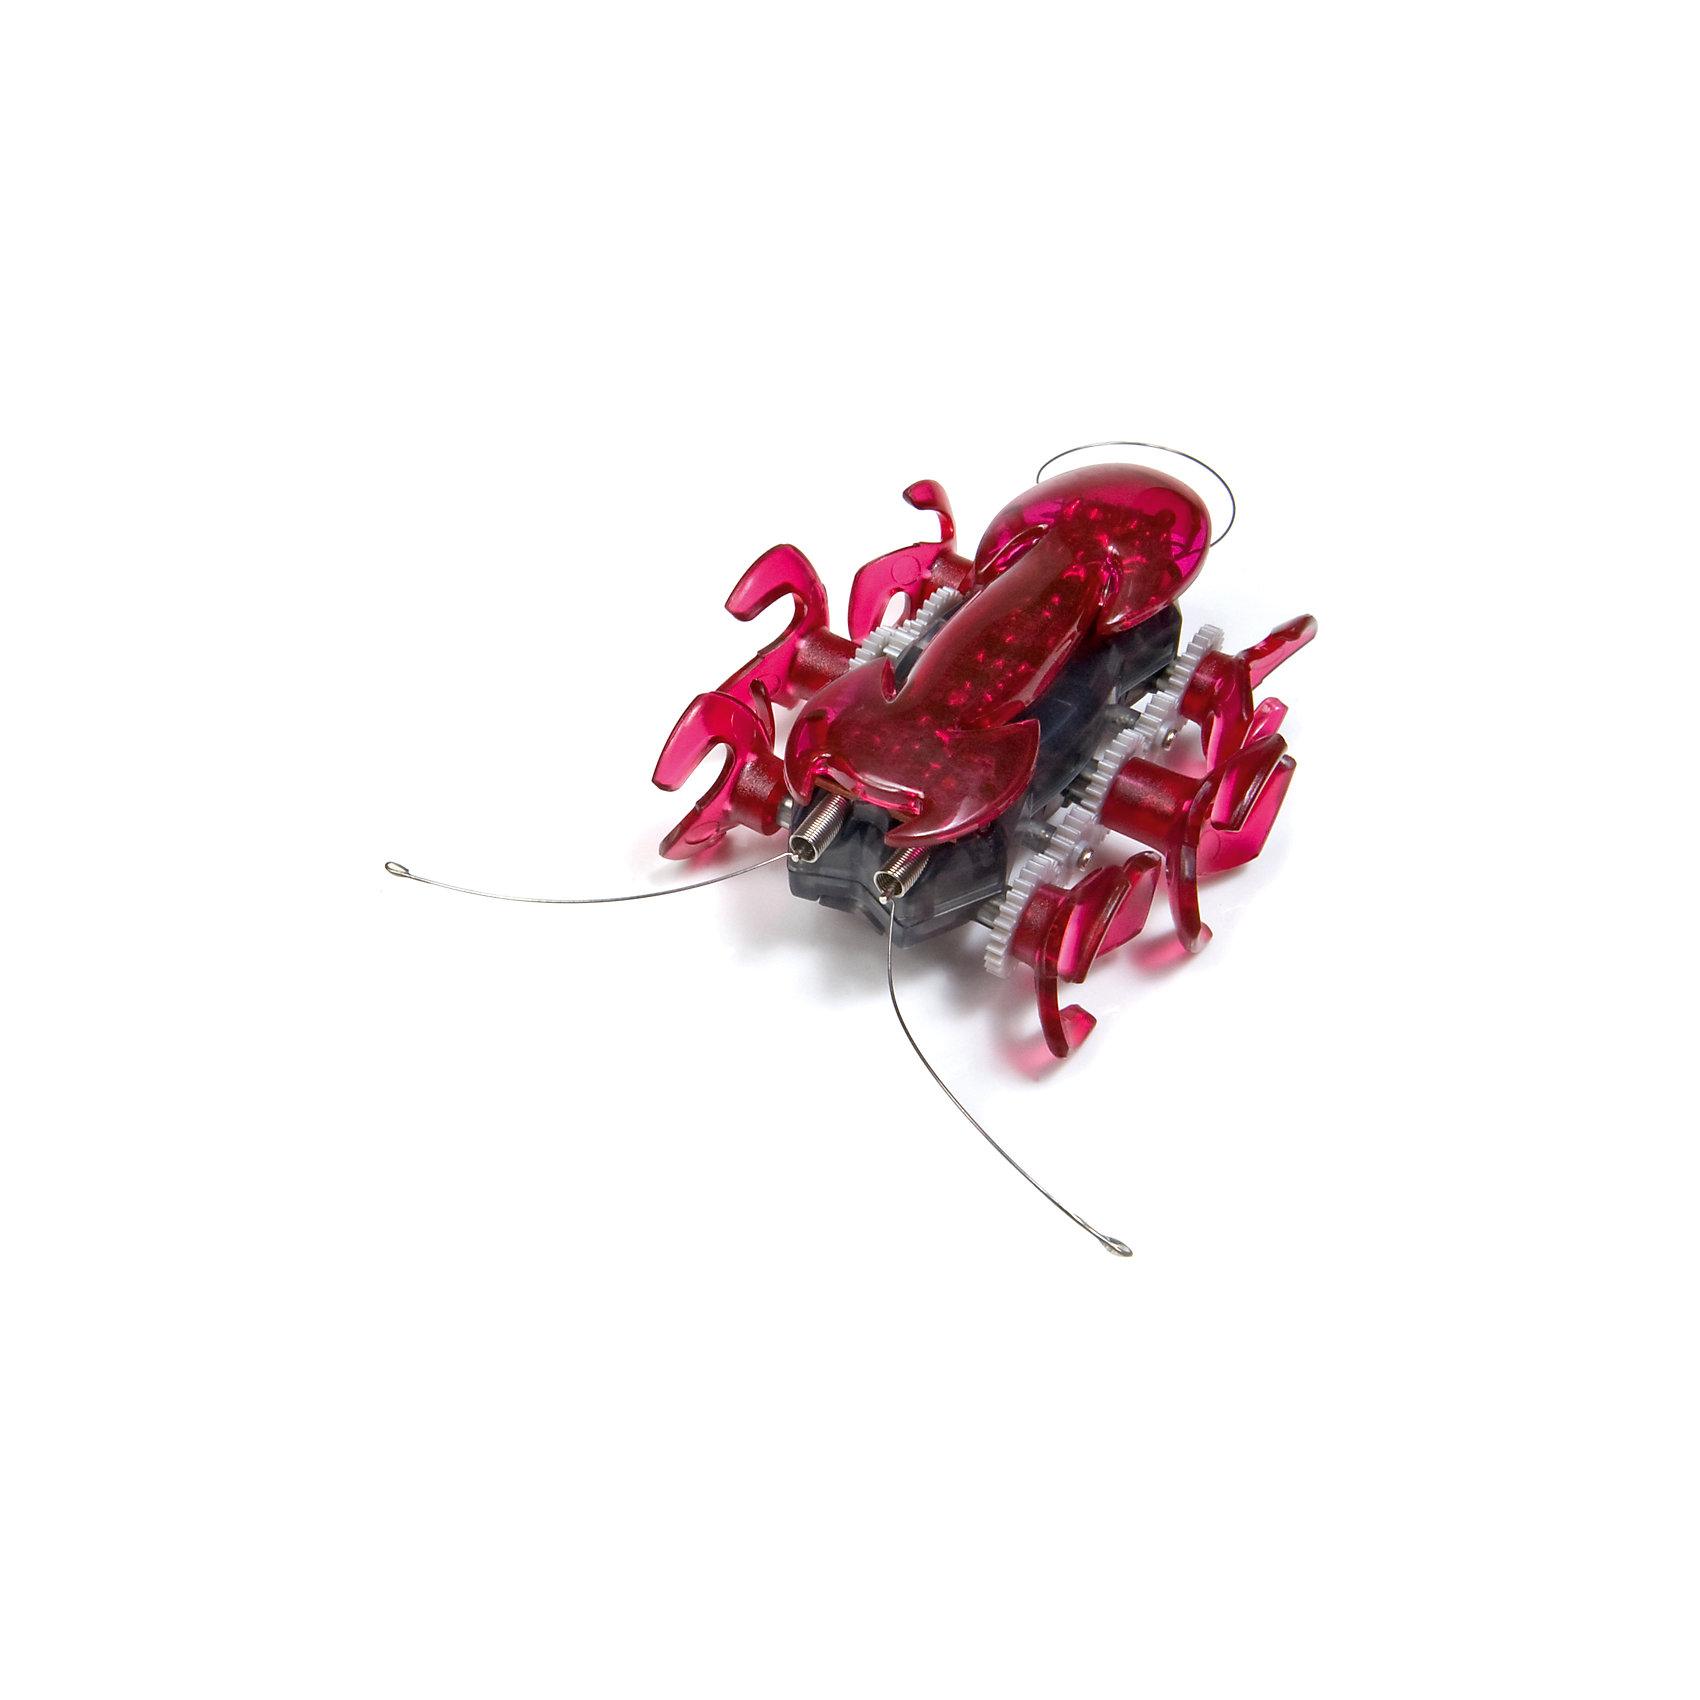 - Микро-робот Муравей, малиновый, Hexbug hexbug набор нано хэбитат